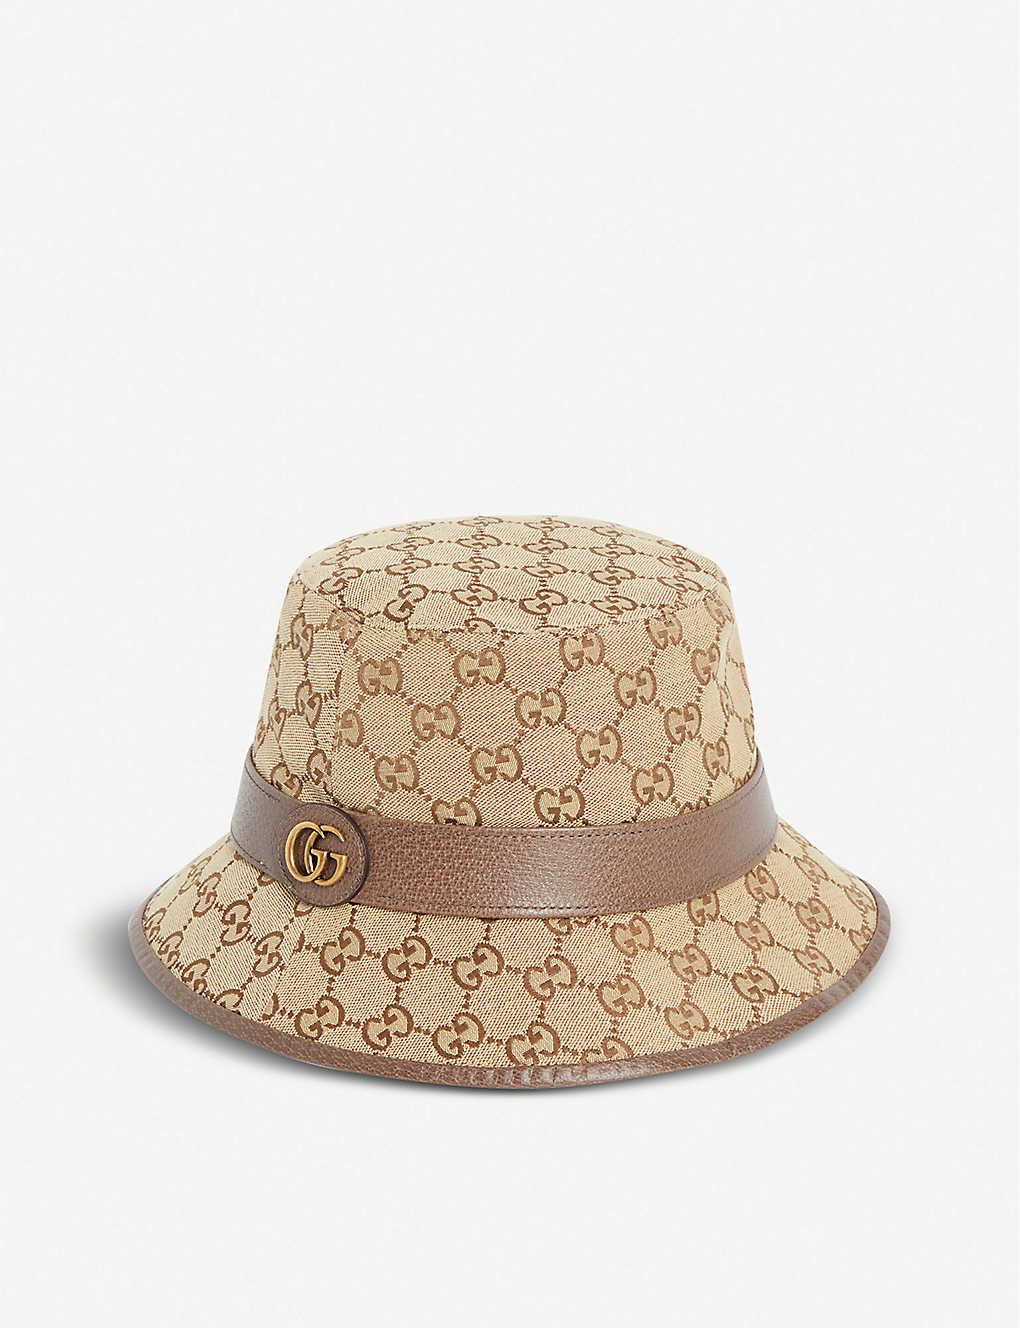 dd47ccda313242 GUCCI - Monogrammed canvas bucket hat | Selfridges.com